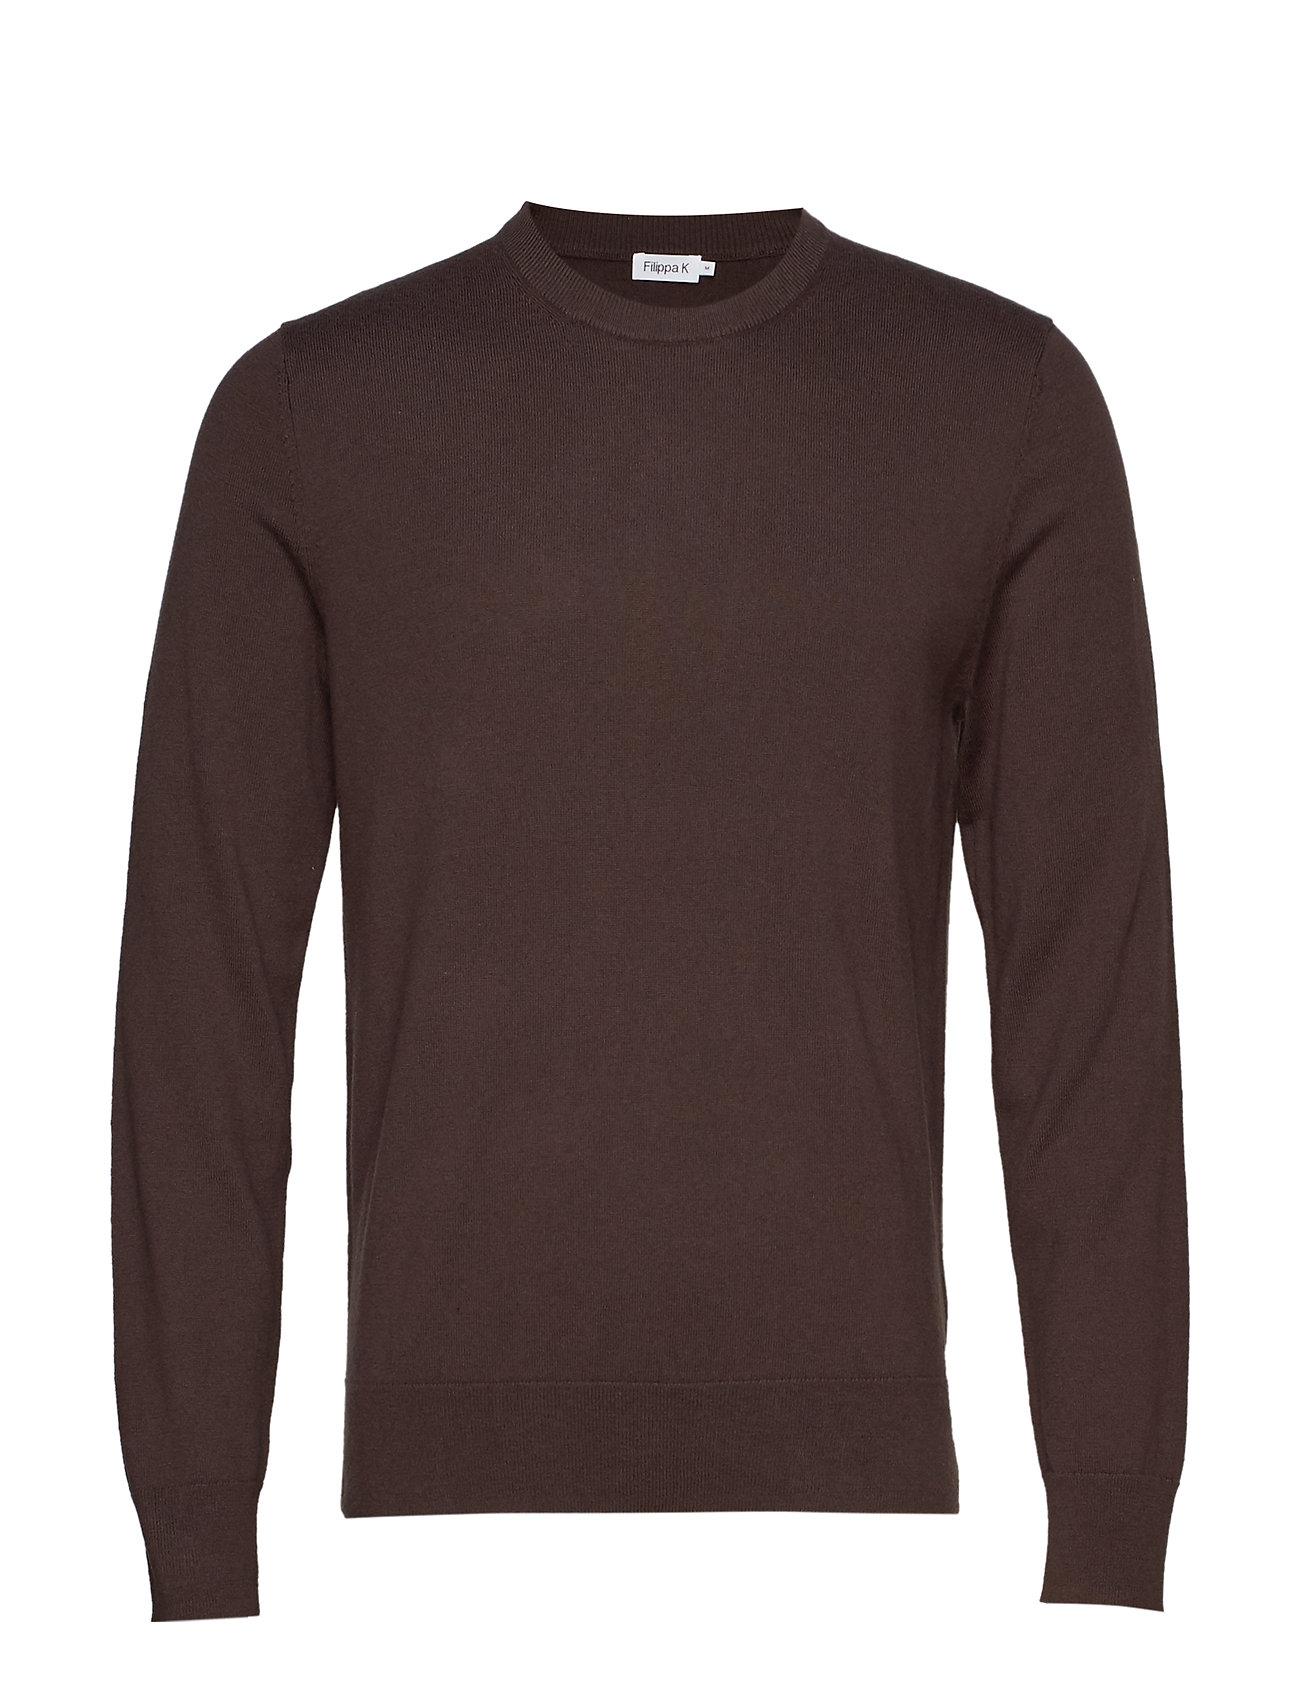 Filippa K M. Cotton Merino Basic Sweater - DARK MOLE